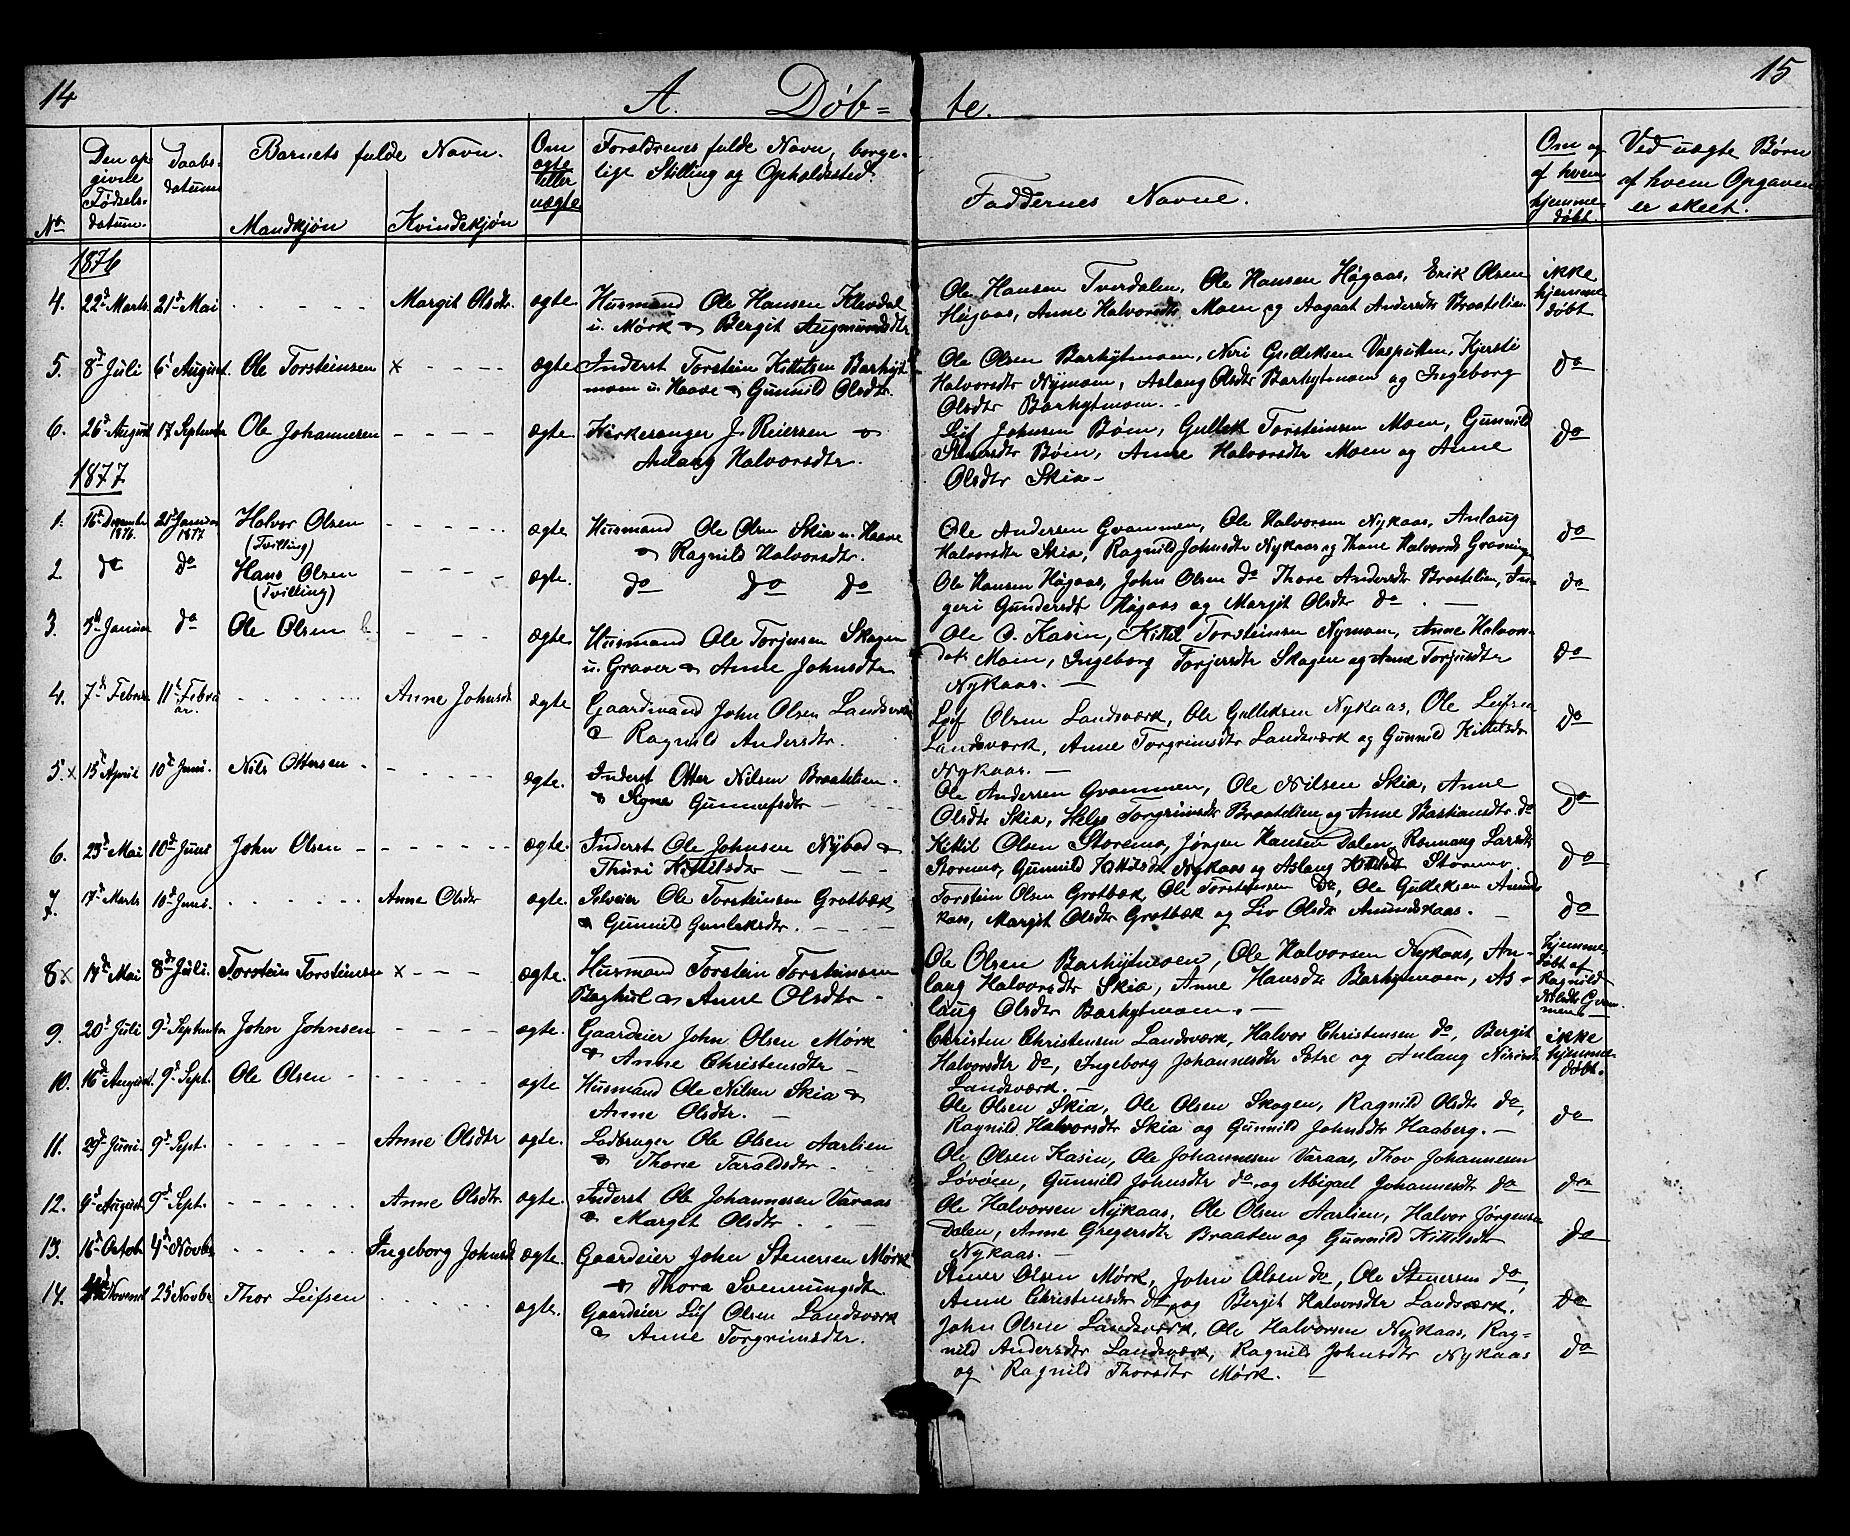 SAKO, Heddal kirkebøker, G/Gb/L0001: Klokkerbok nr. II 1, 1866-1887, s. 14-15